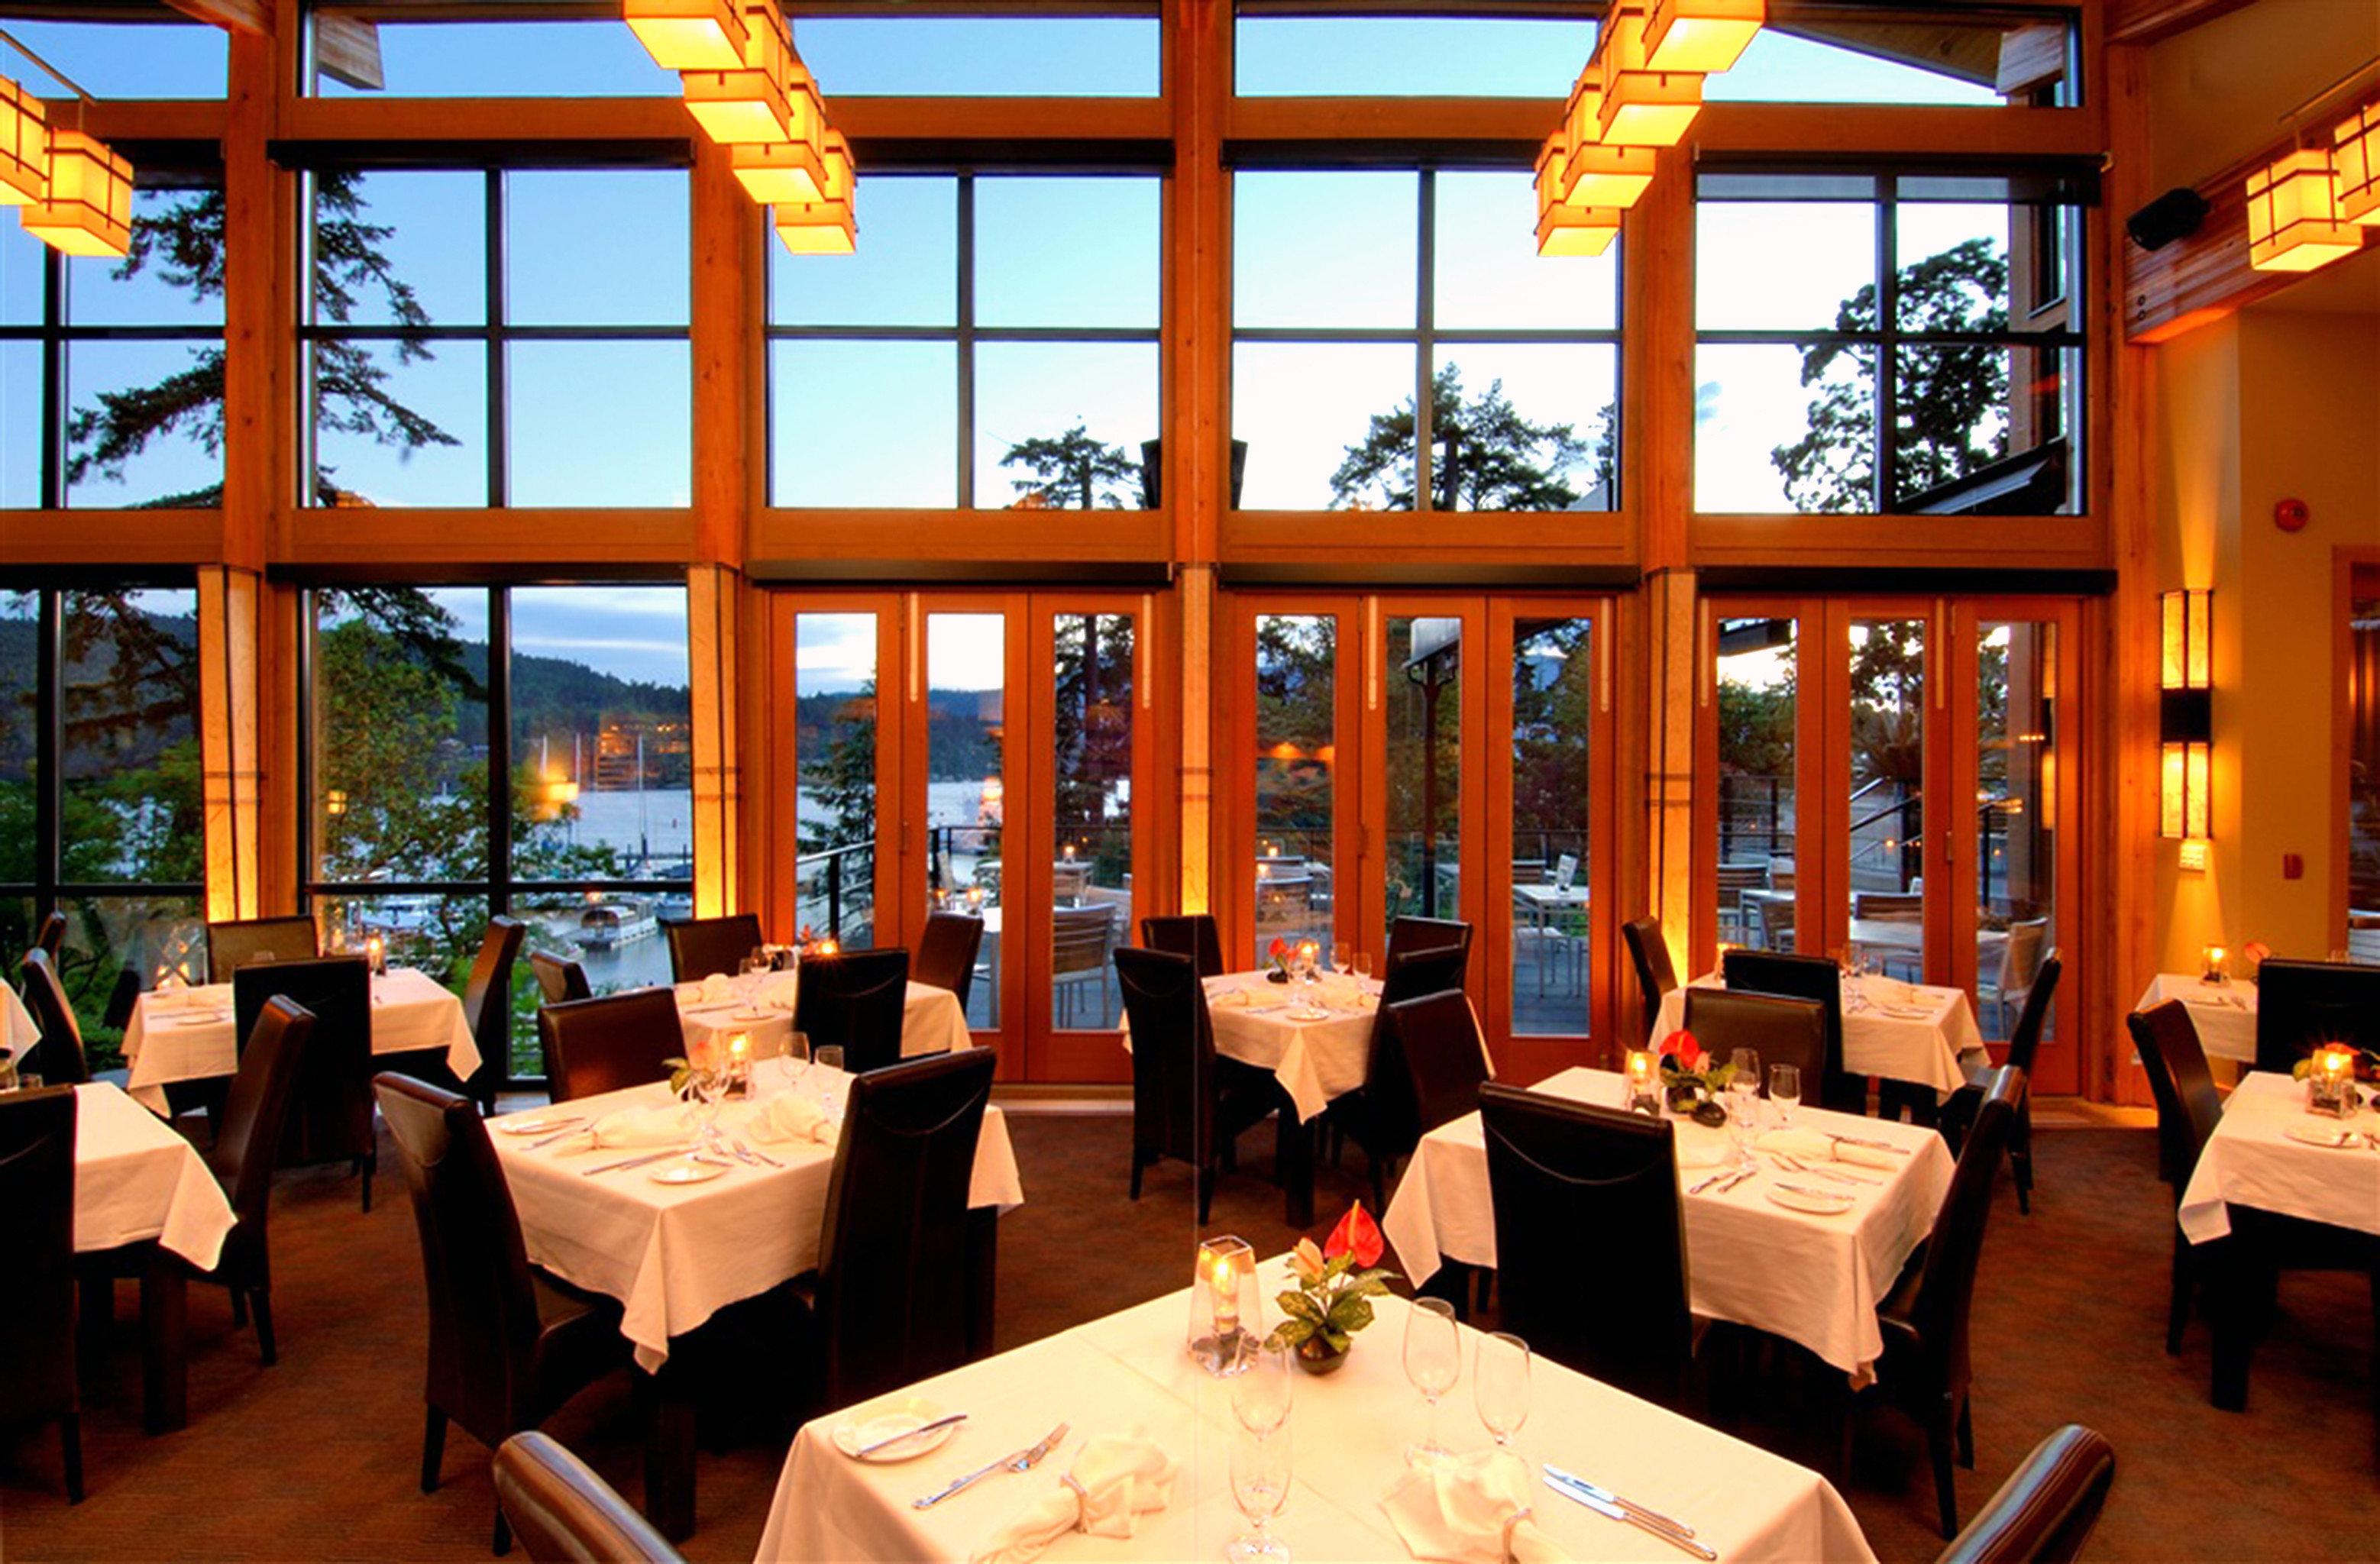 Dining Eat Modern Outdoor Activities Outdoors Resort Romantic Waterfront restaurant function hall